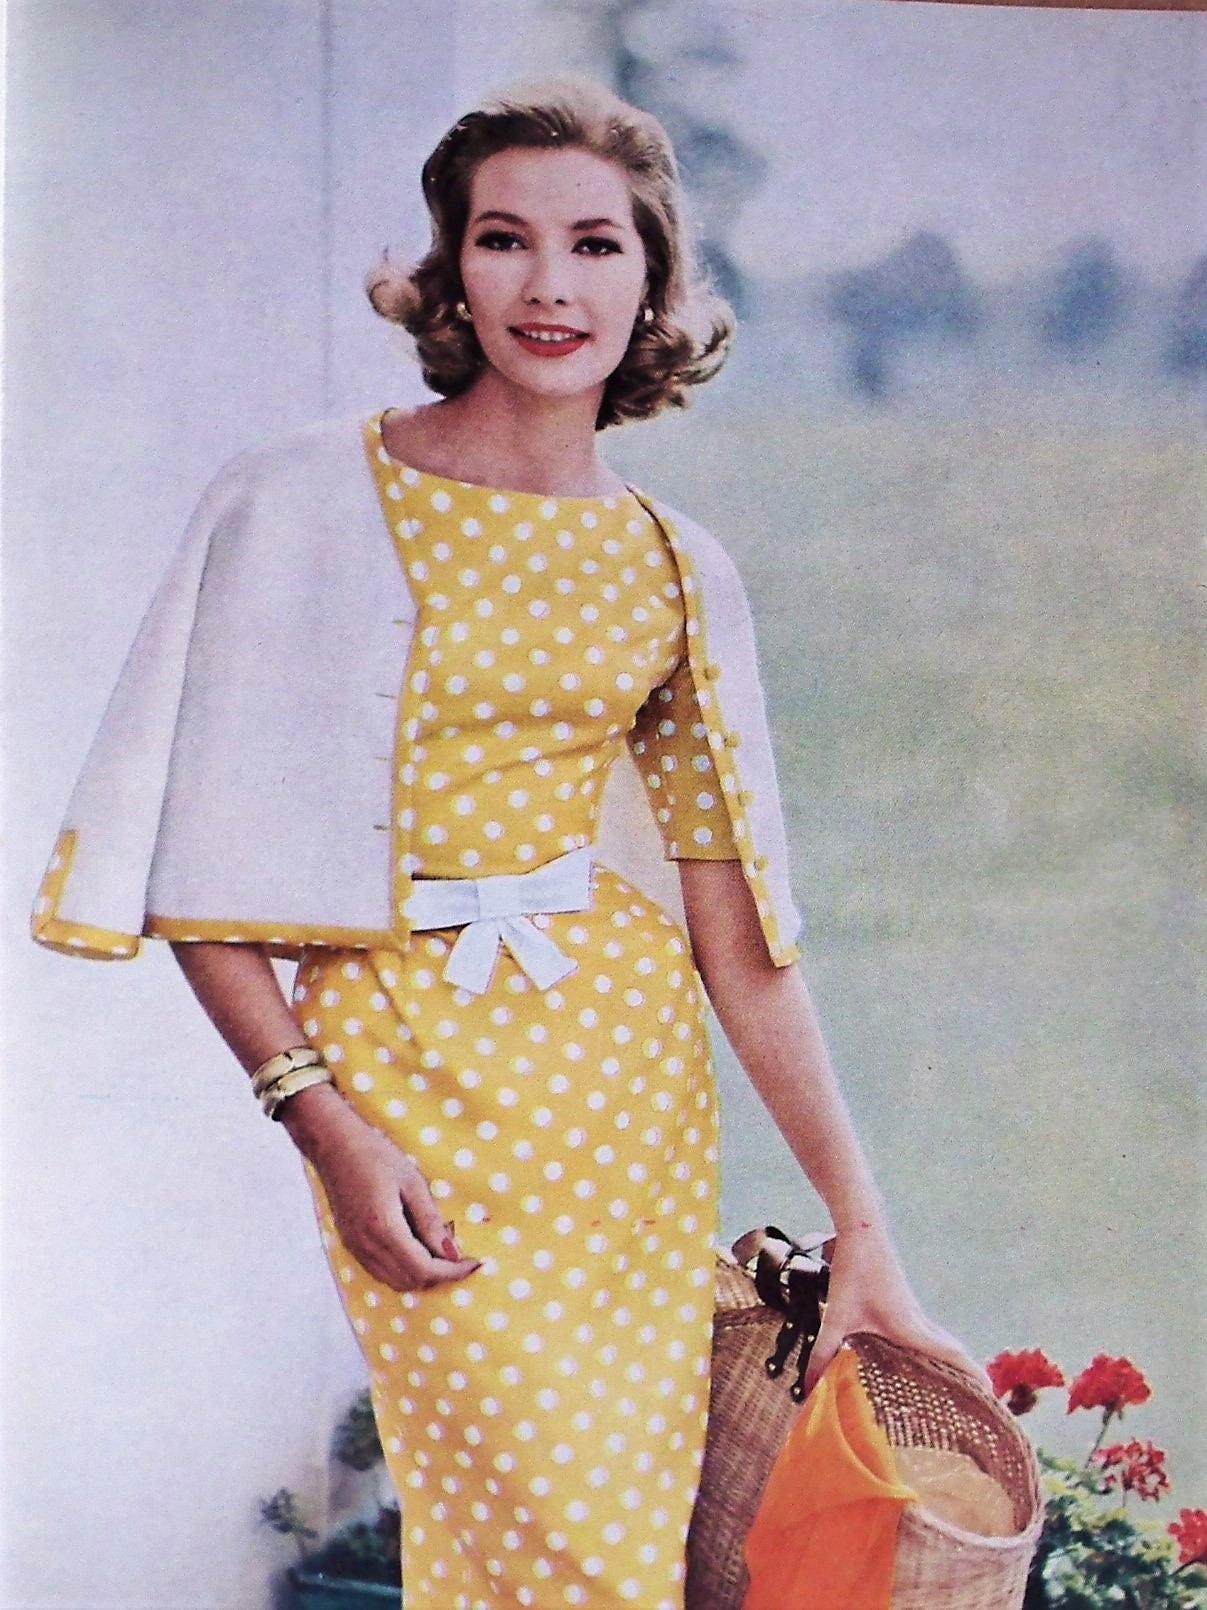 Vogue Knitting Book No 56 1960 Vintage Knitting Patterns 1950s 1960s ...